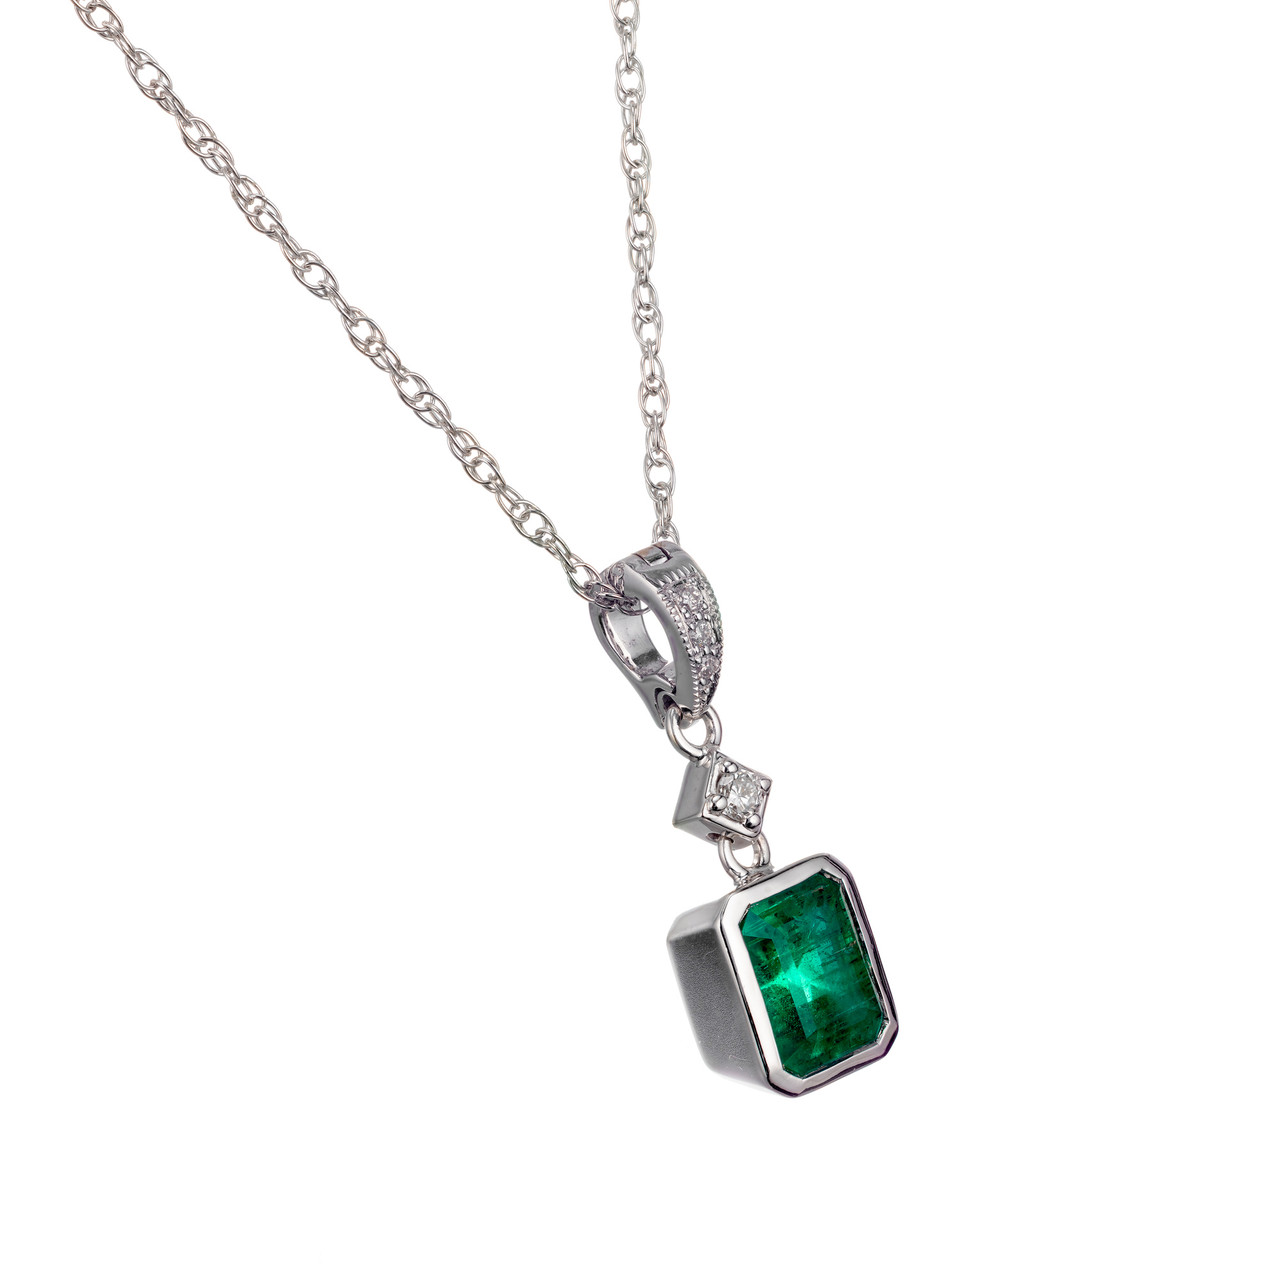 Peter Suchy Gia Certified 94 Carat Emerald Diamond Gold Pendant Necklace Petersuchyjewelers